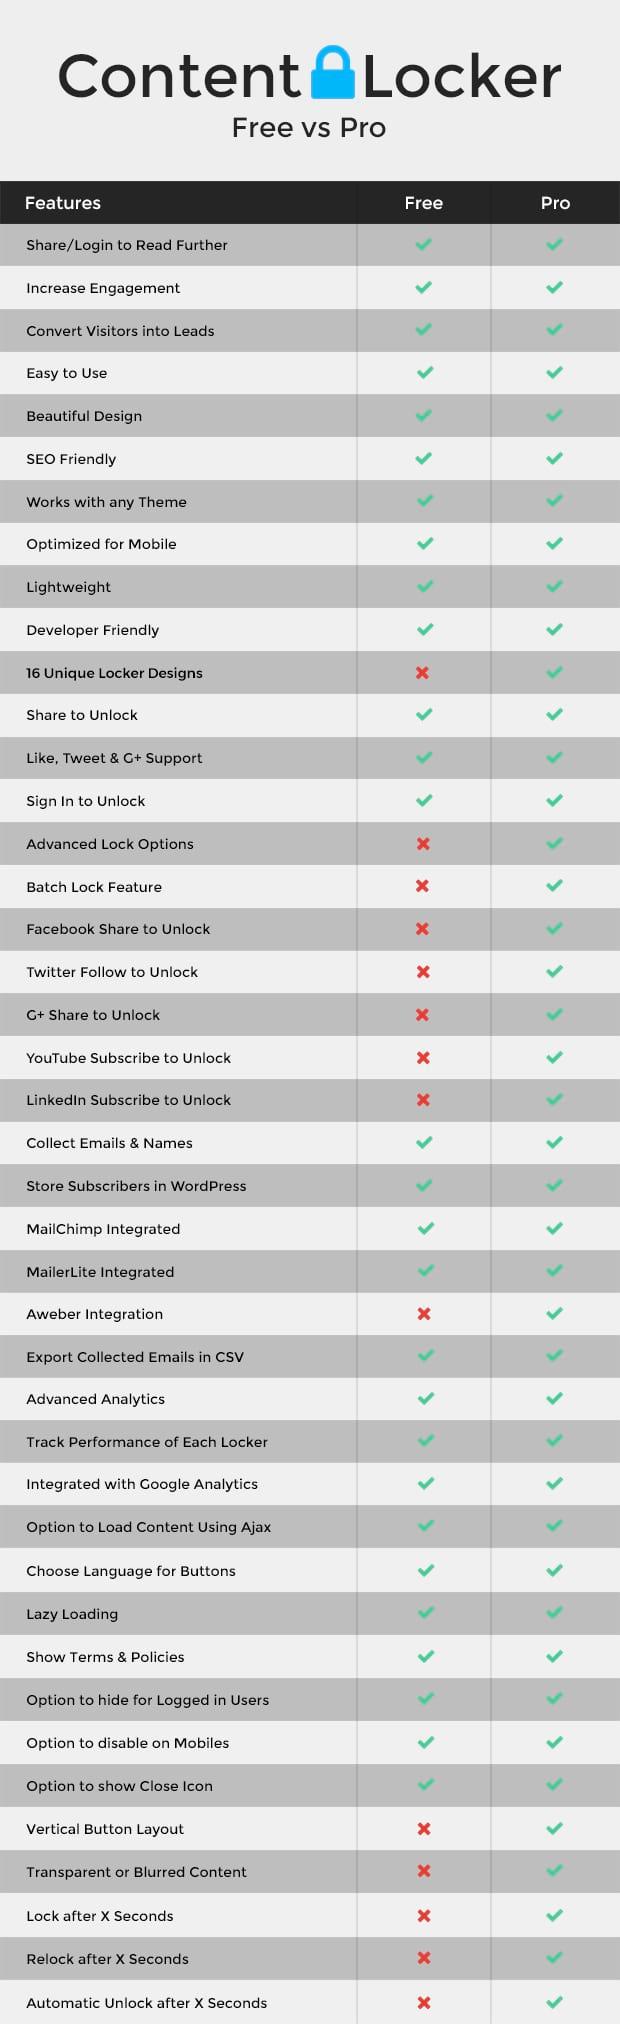 Content Locker Free vs Pro